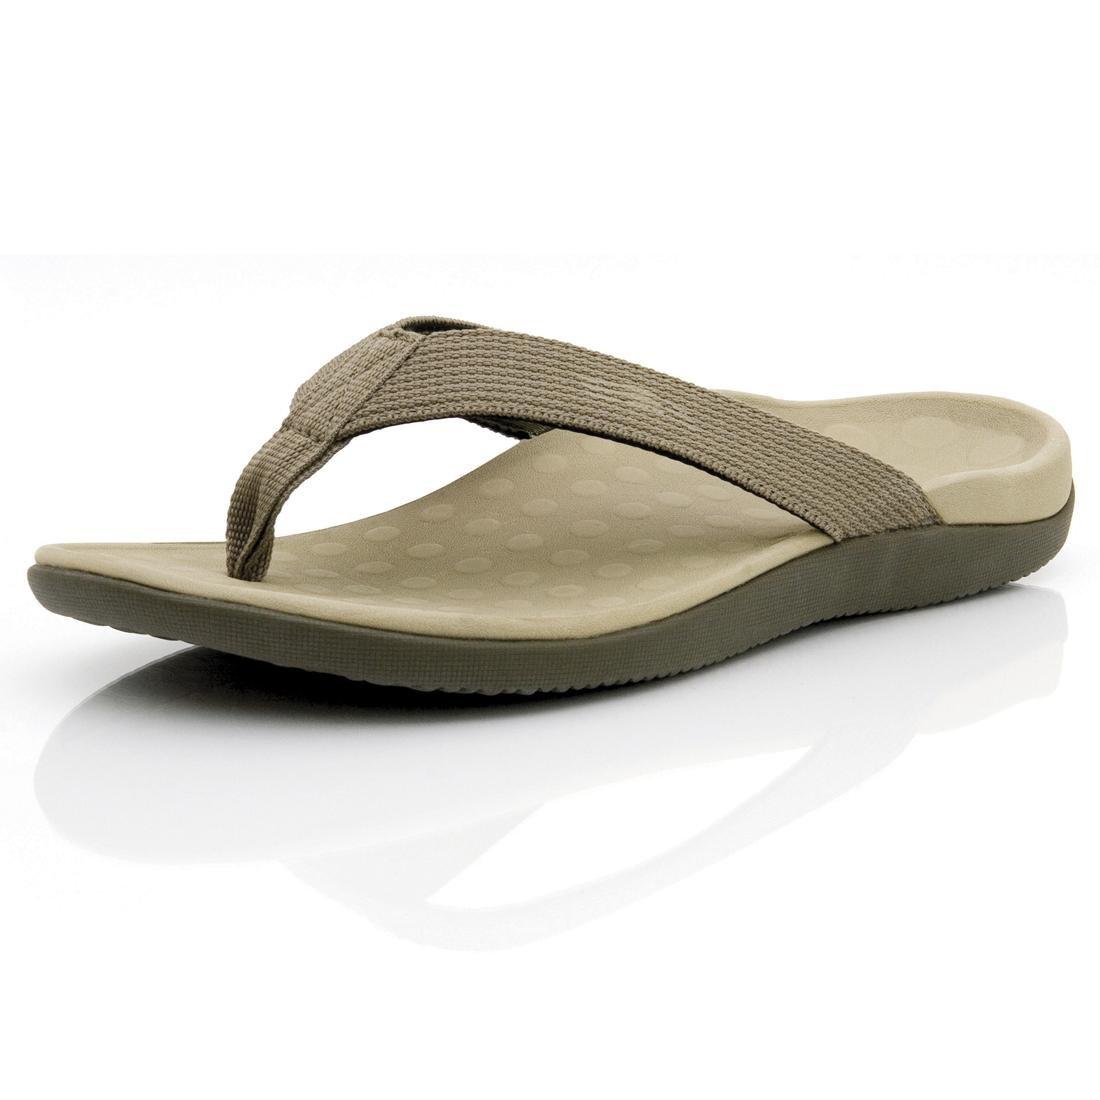 Orthaheel Mens/Womens Wave Sandals